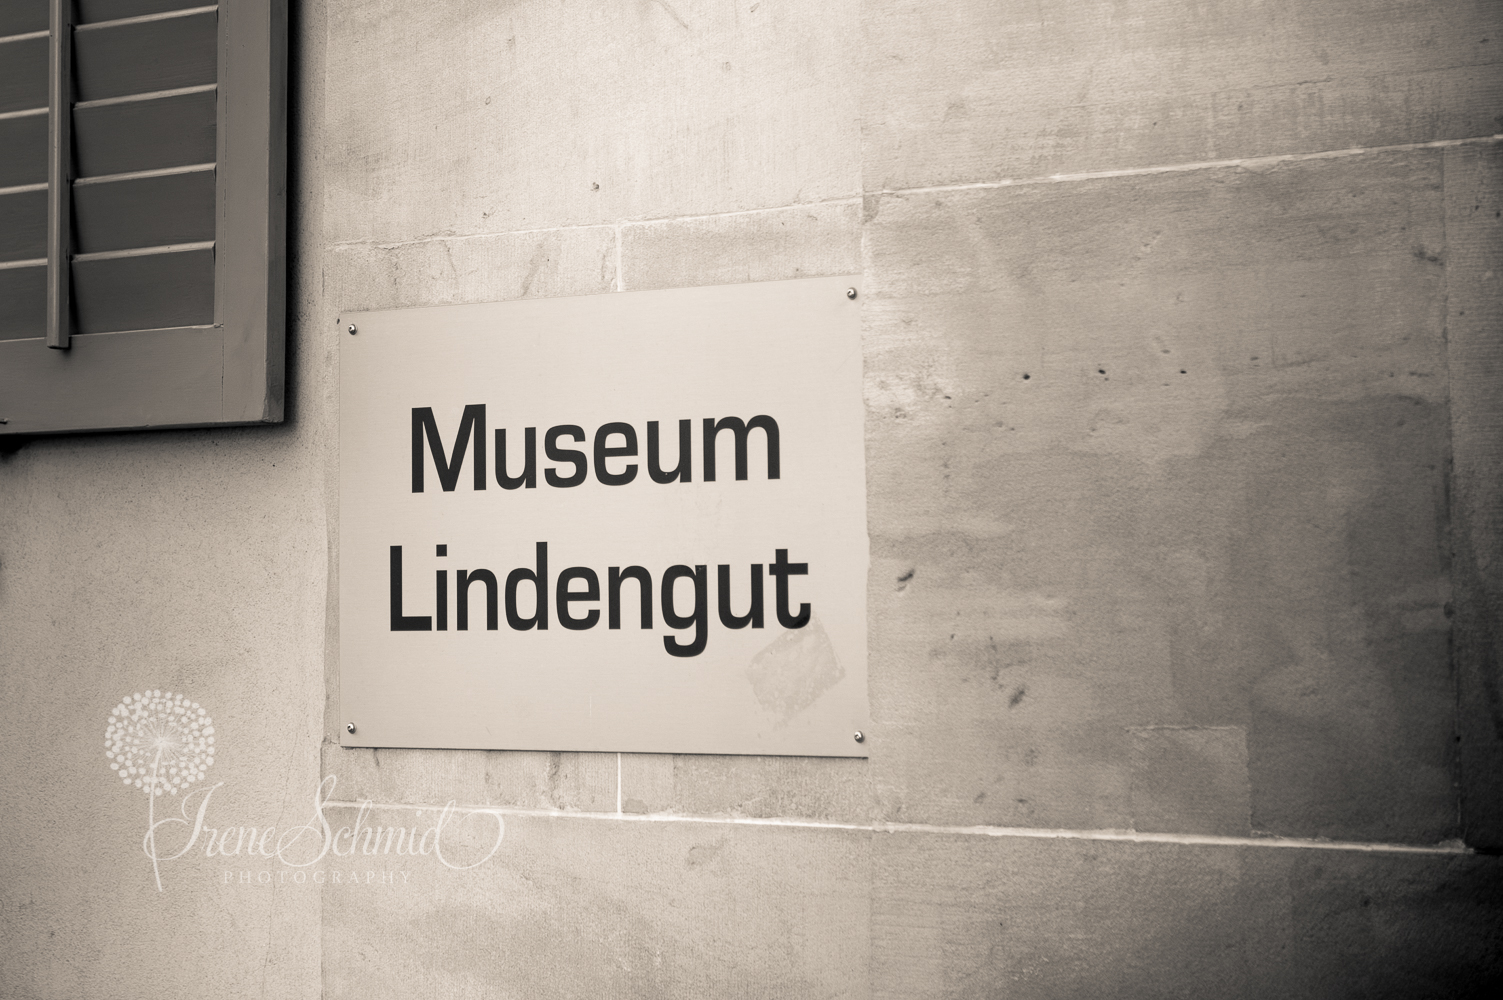 Zivile Trauung in Winterthur - Irene Schmid Photographie